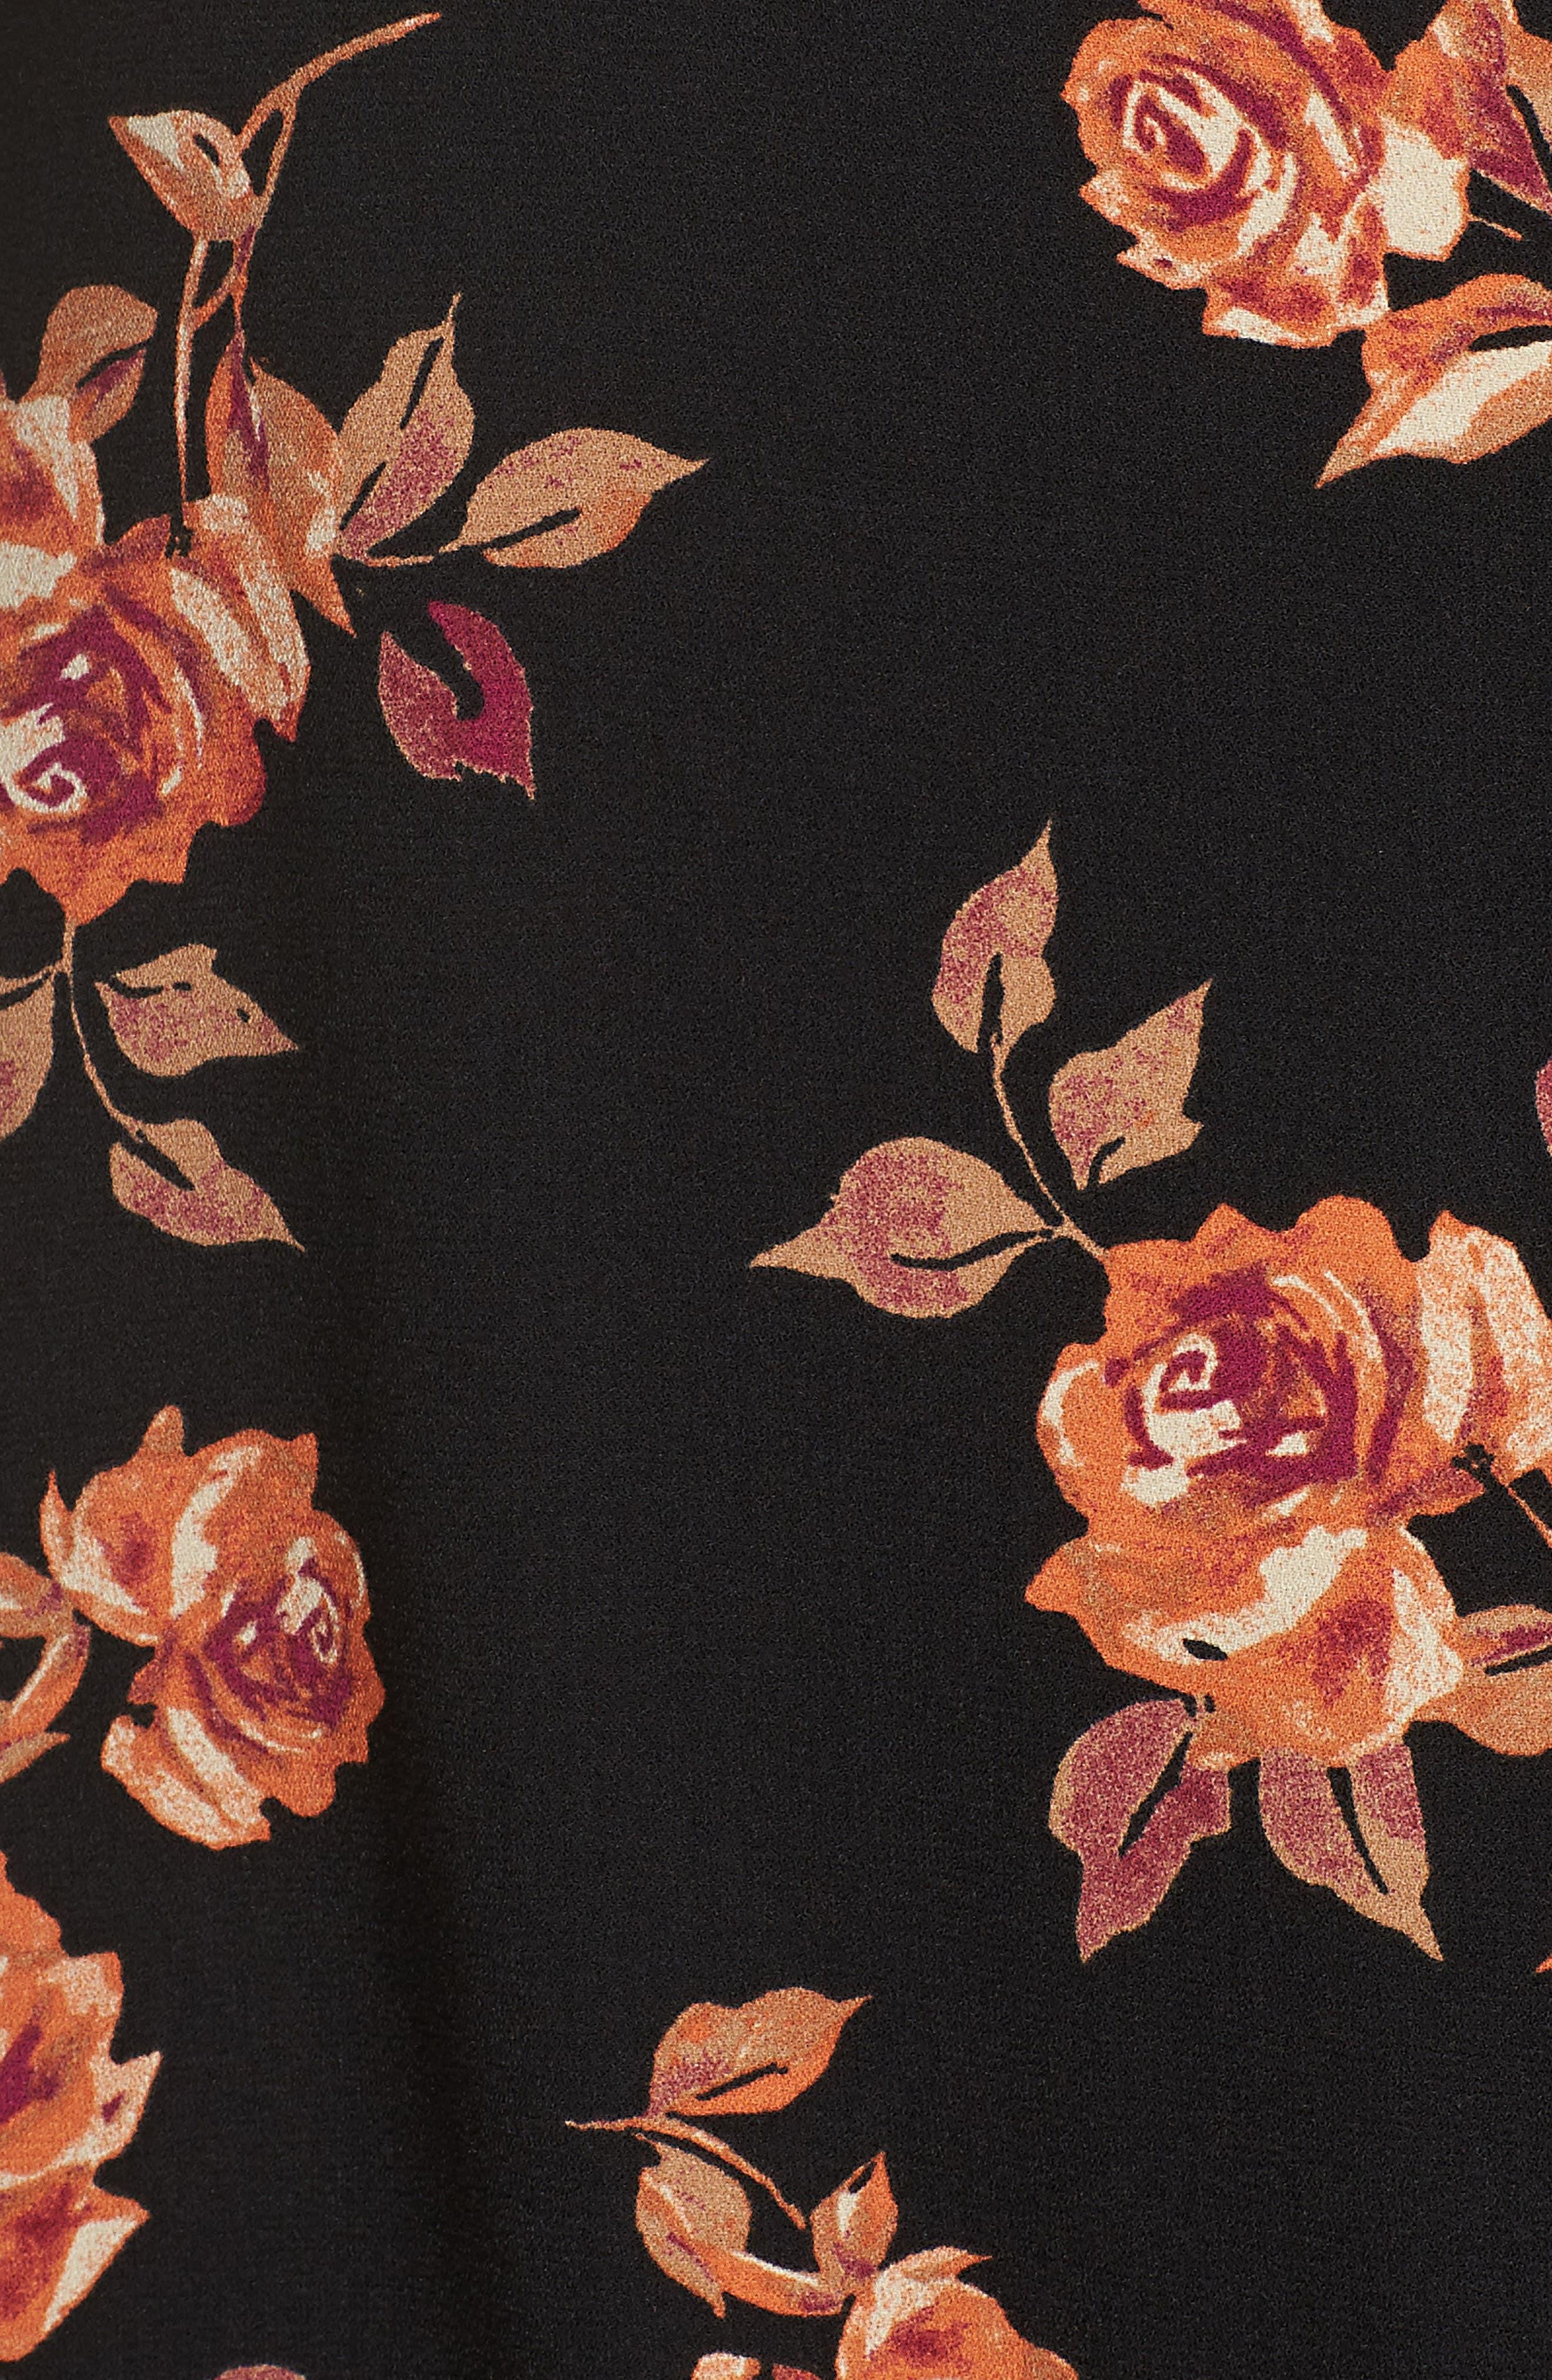 Notched Collar Floral Print Shirt,                             Alternate thumbnail 5, color,                             BLACK POP FLORAL